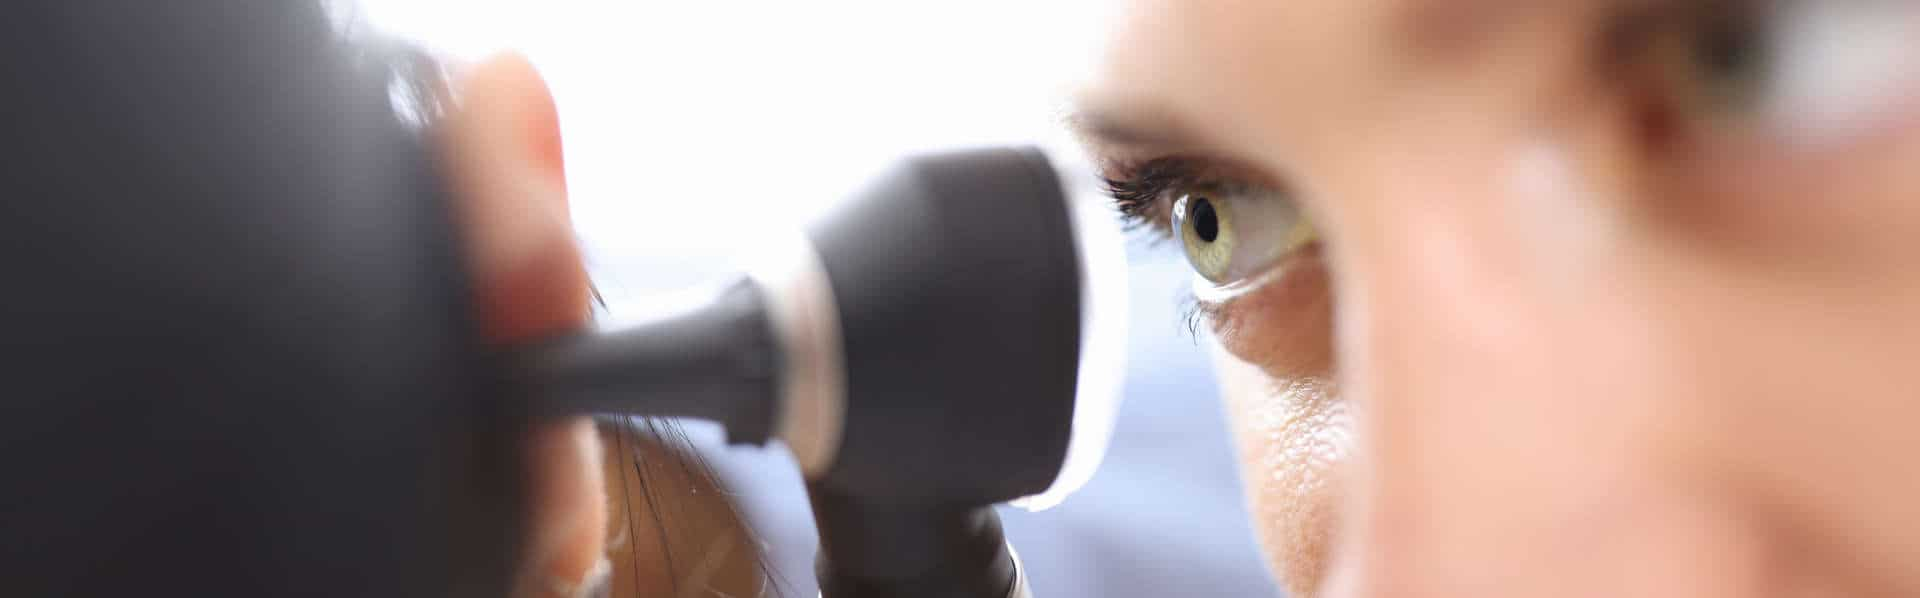 otolaryngologist-examining-woman-s-ear-with-ent-telescope-hospital-hearing-problem 1 (2)